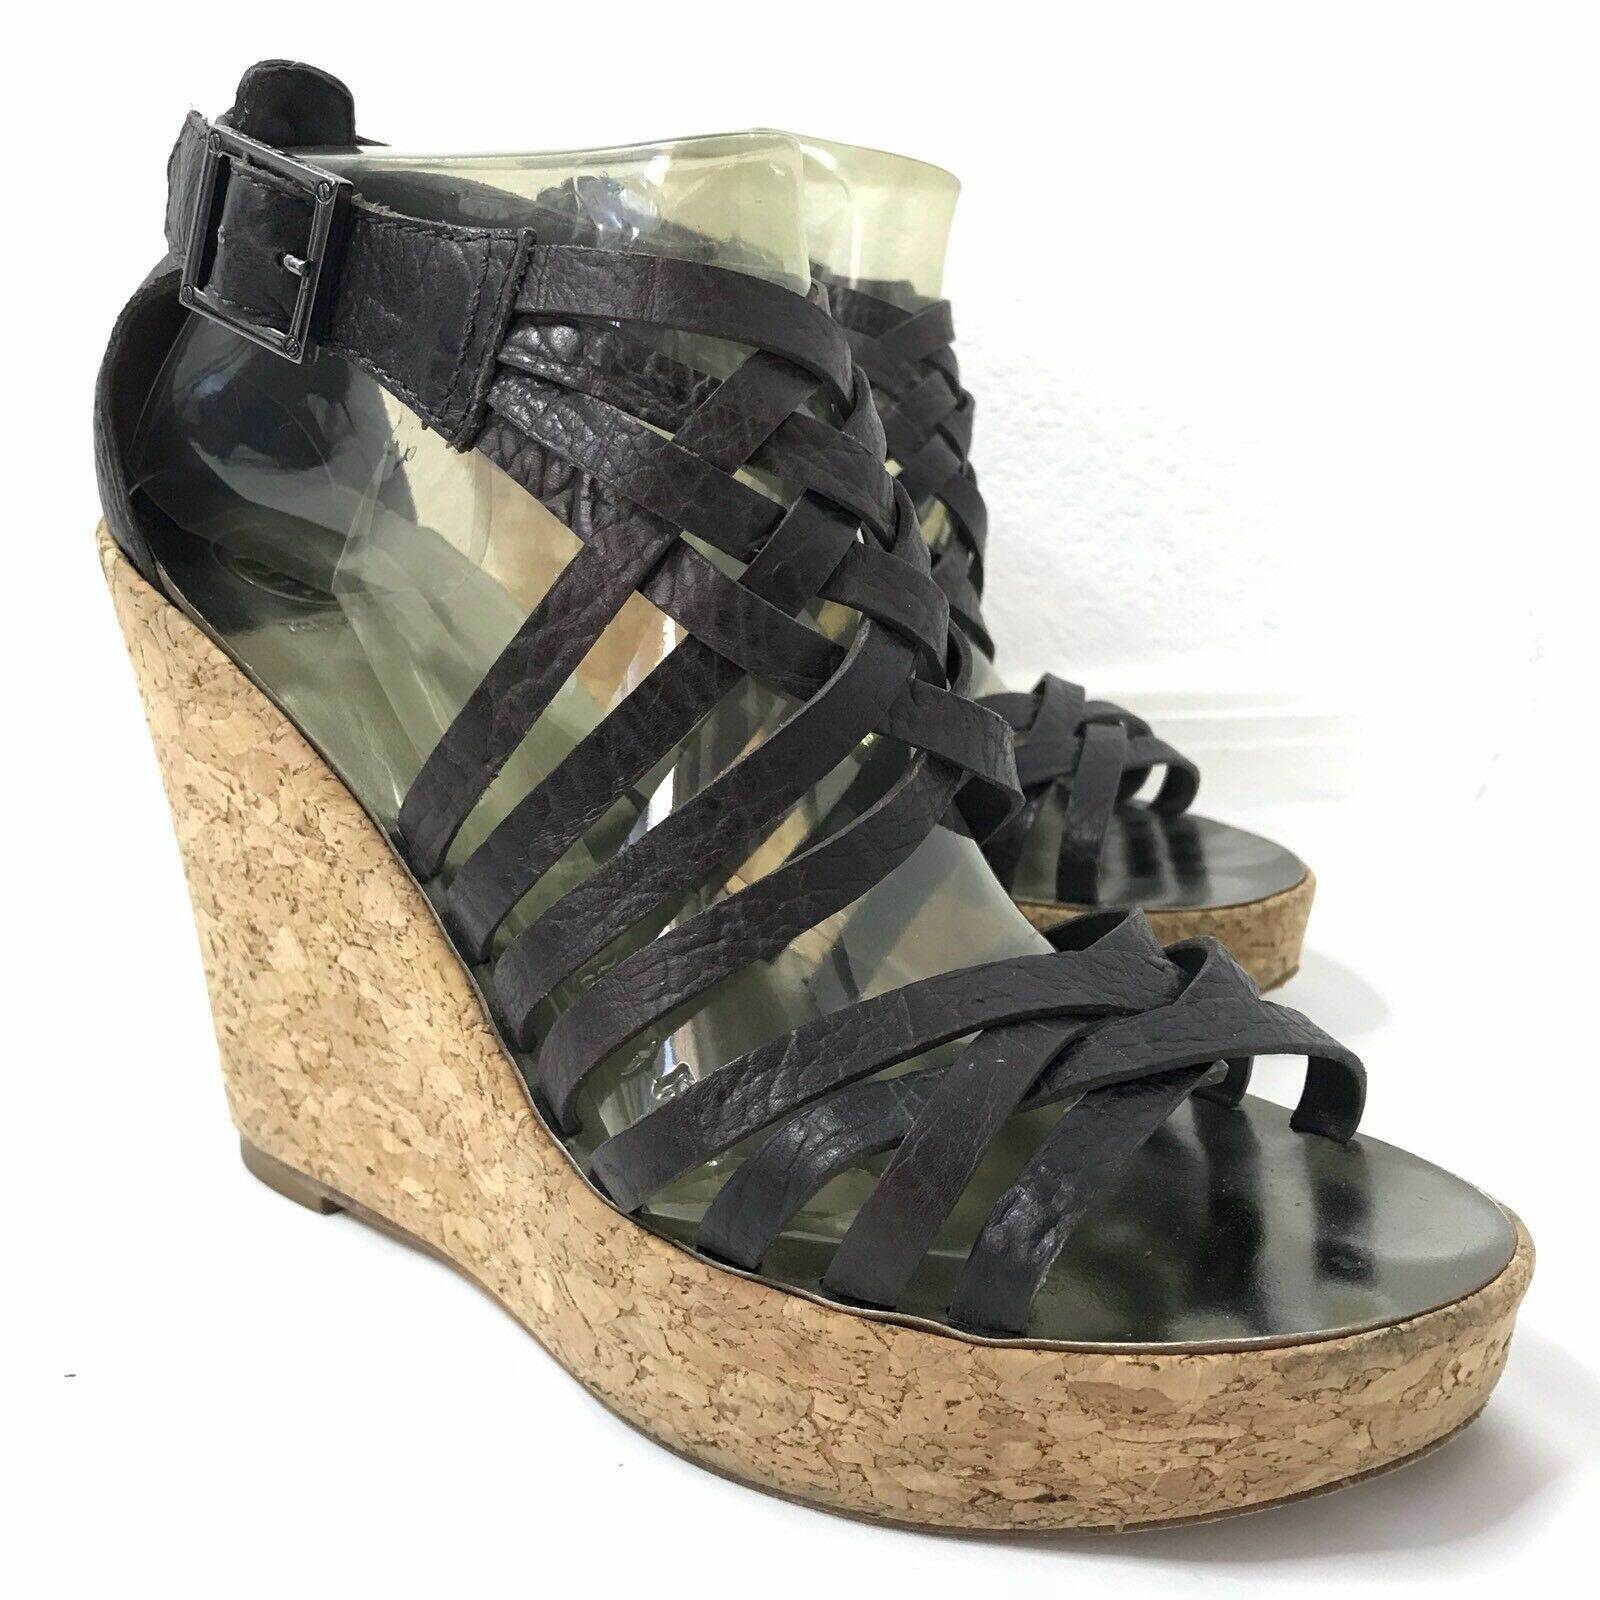 Tory Burch Cork Wedges Platform Heel Leather Cross Strap Women's 9.5